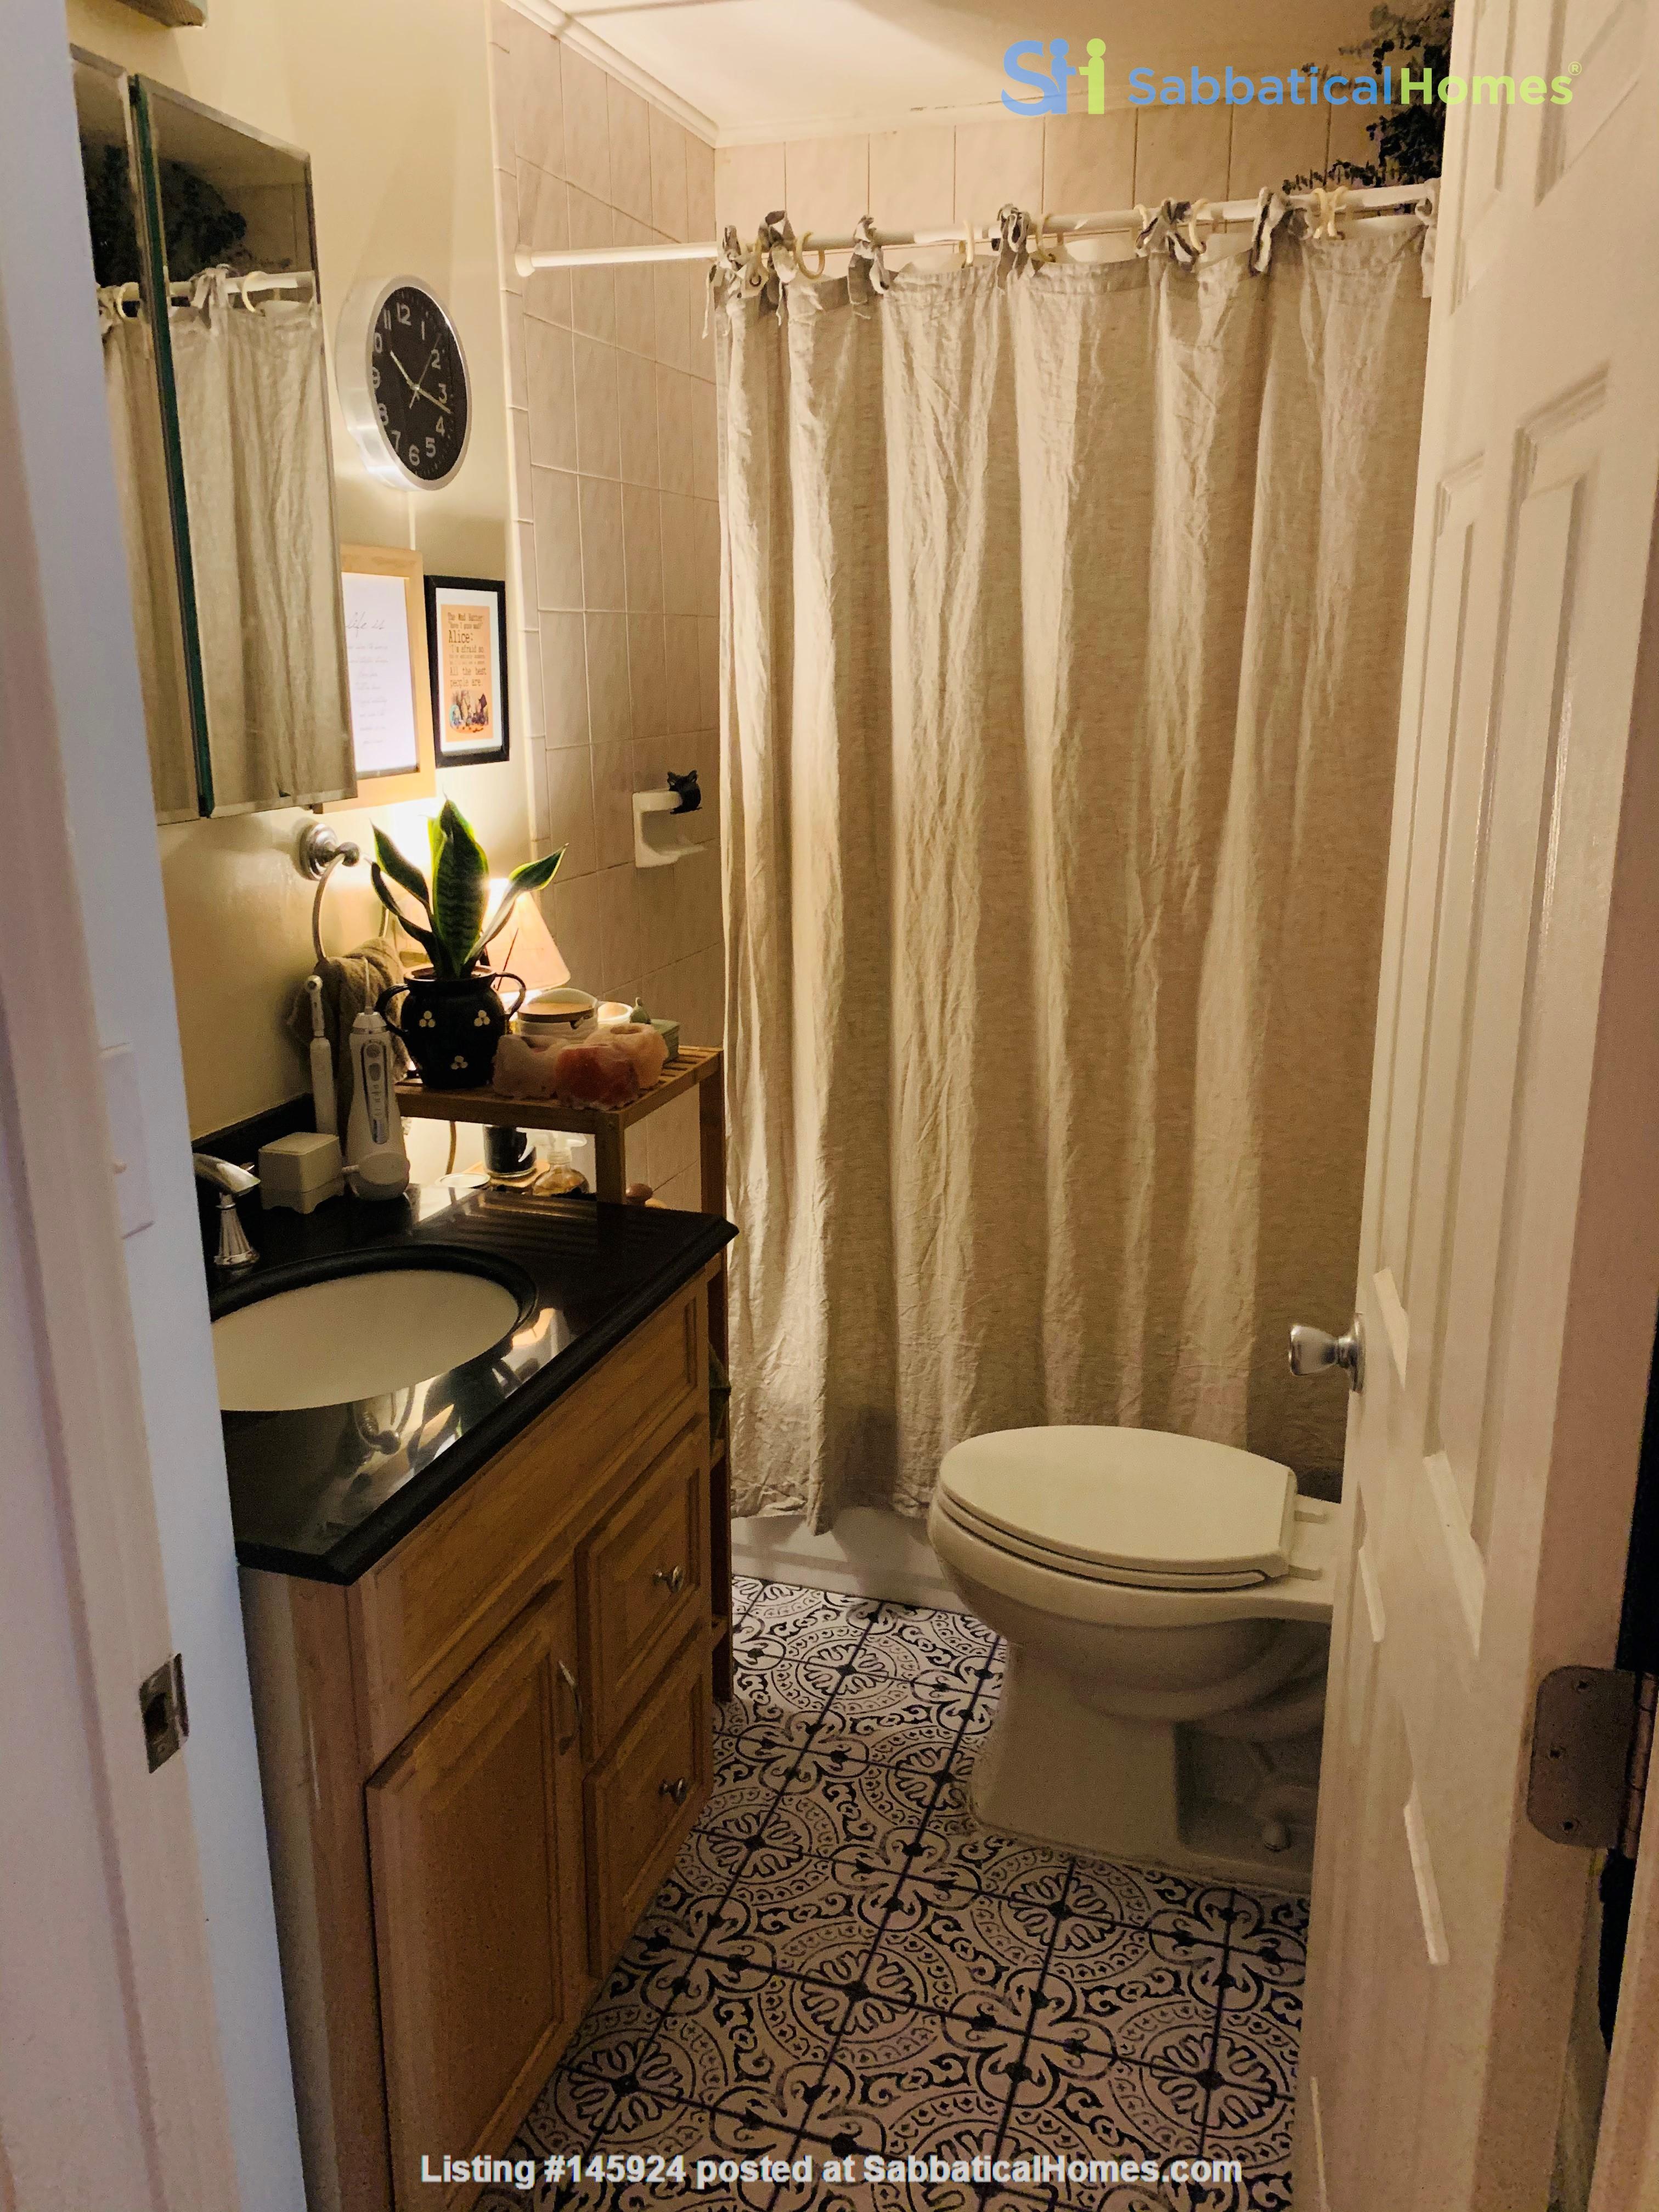 Modern, sunny, 2 bed 1 bath 1st floor unit with W+D, den & backyard garden Home Rental in Cambridge 4